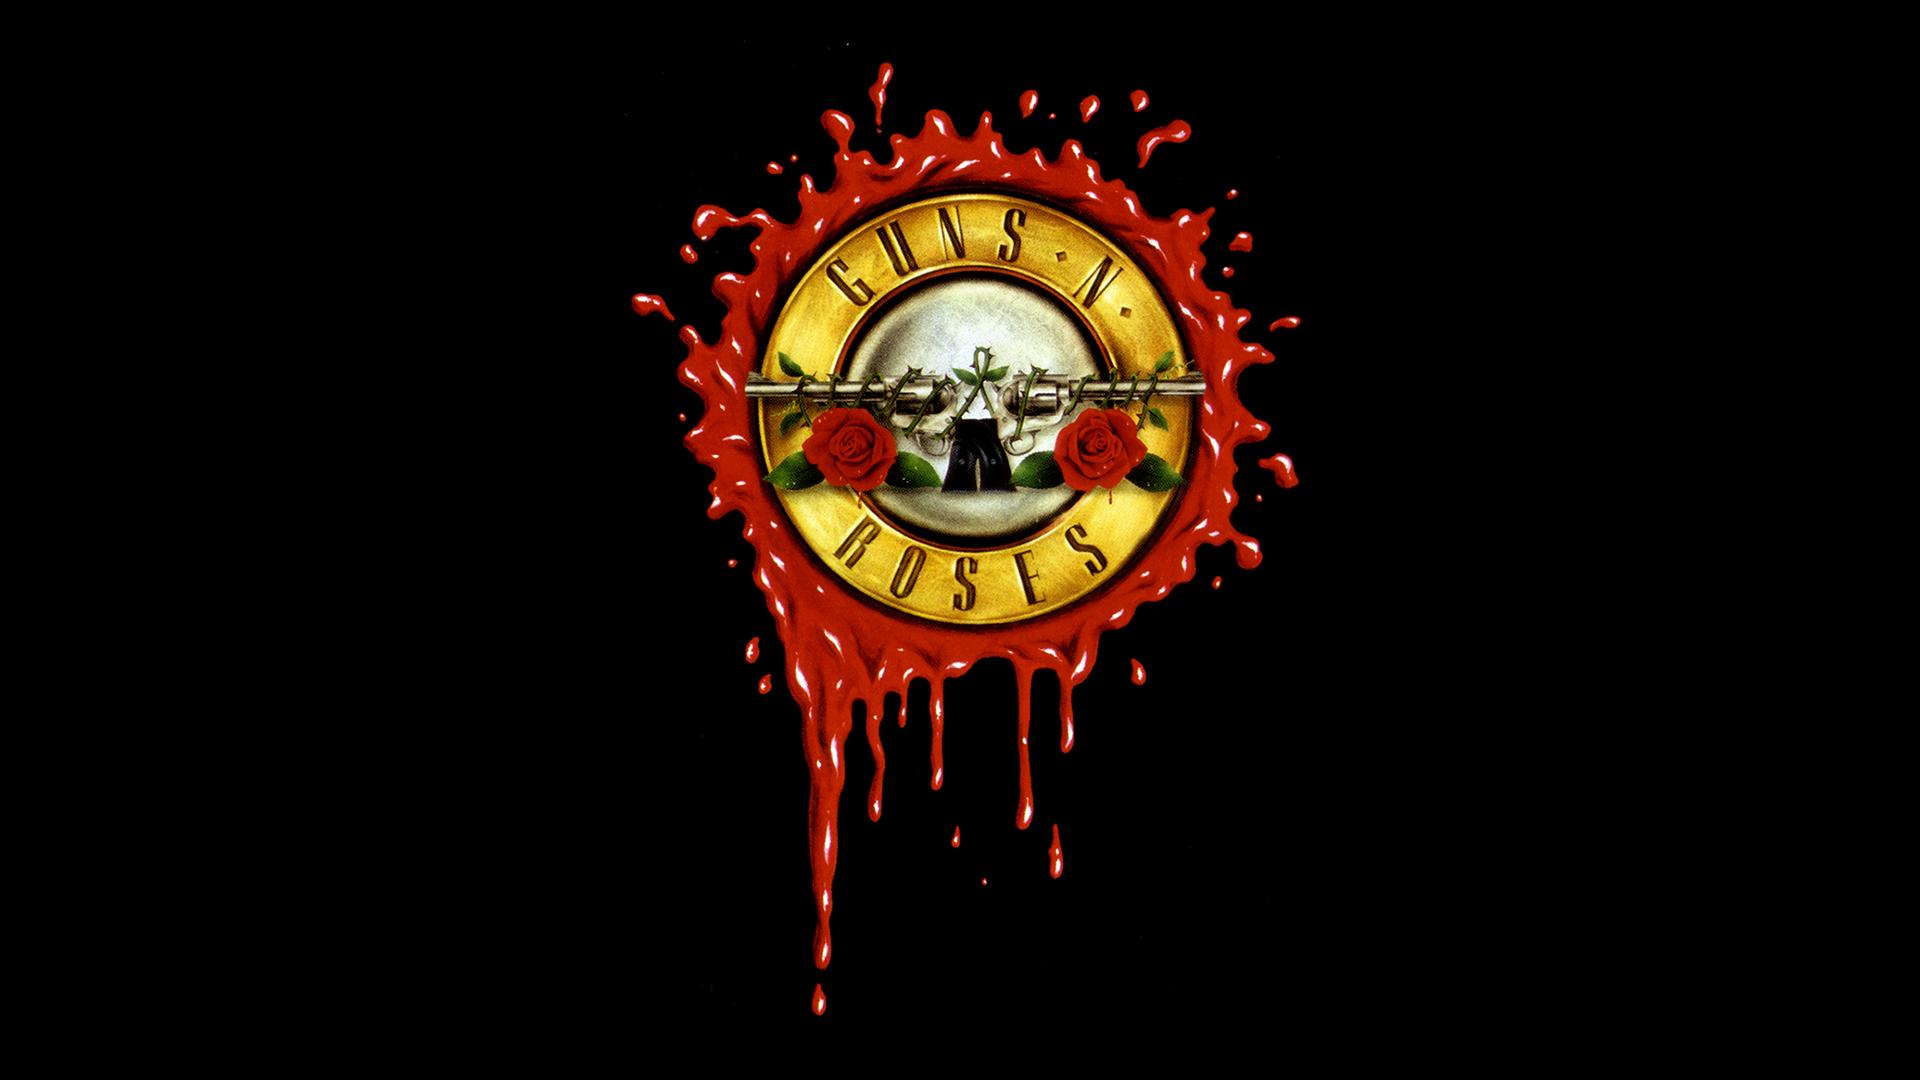 Guns N Roses Logo Wallpaper 1920x1080